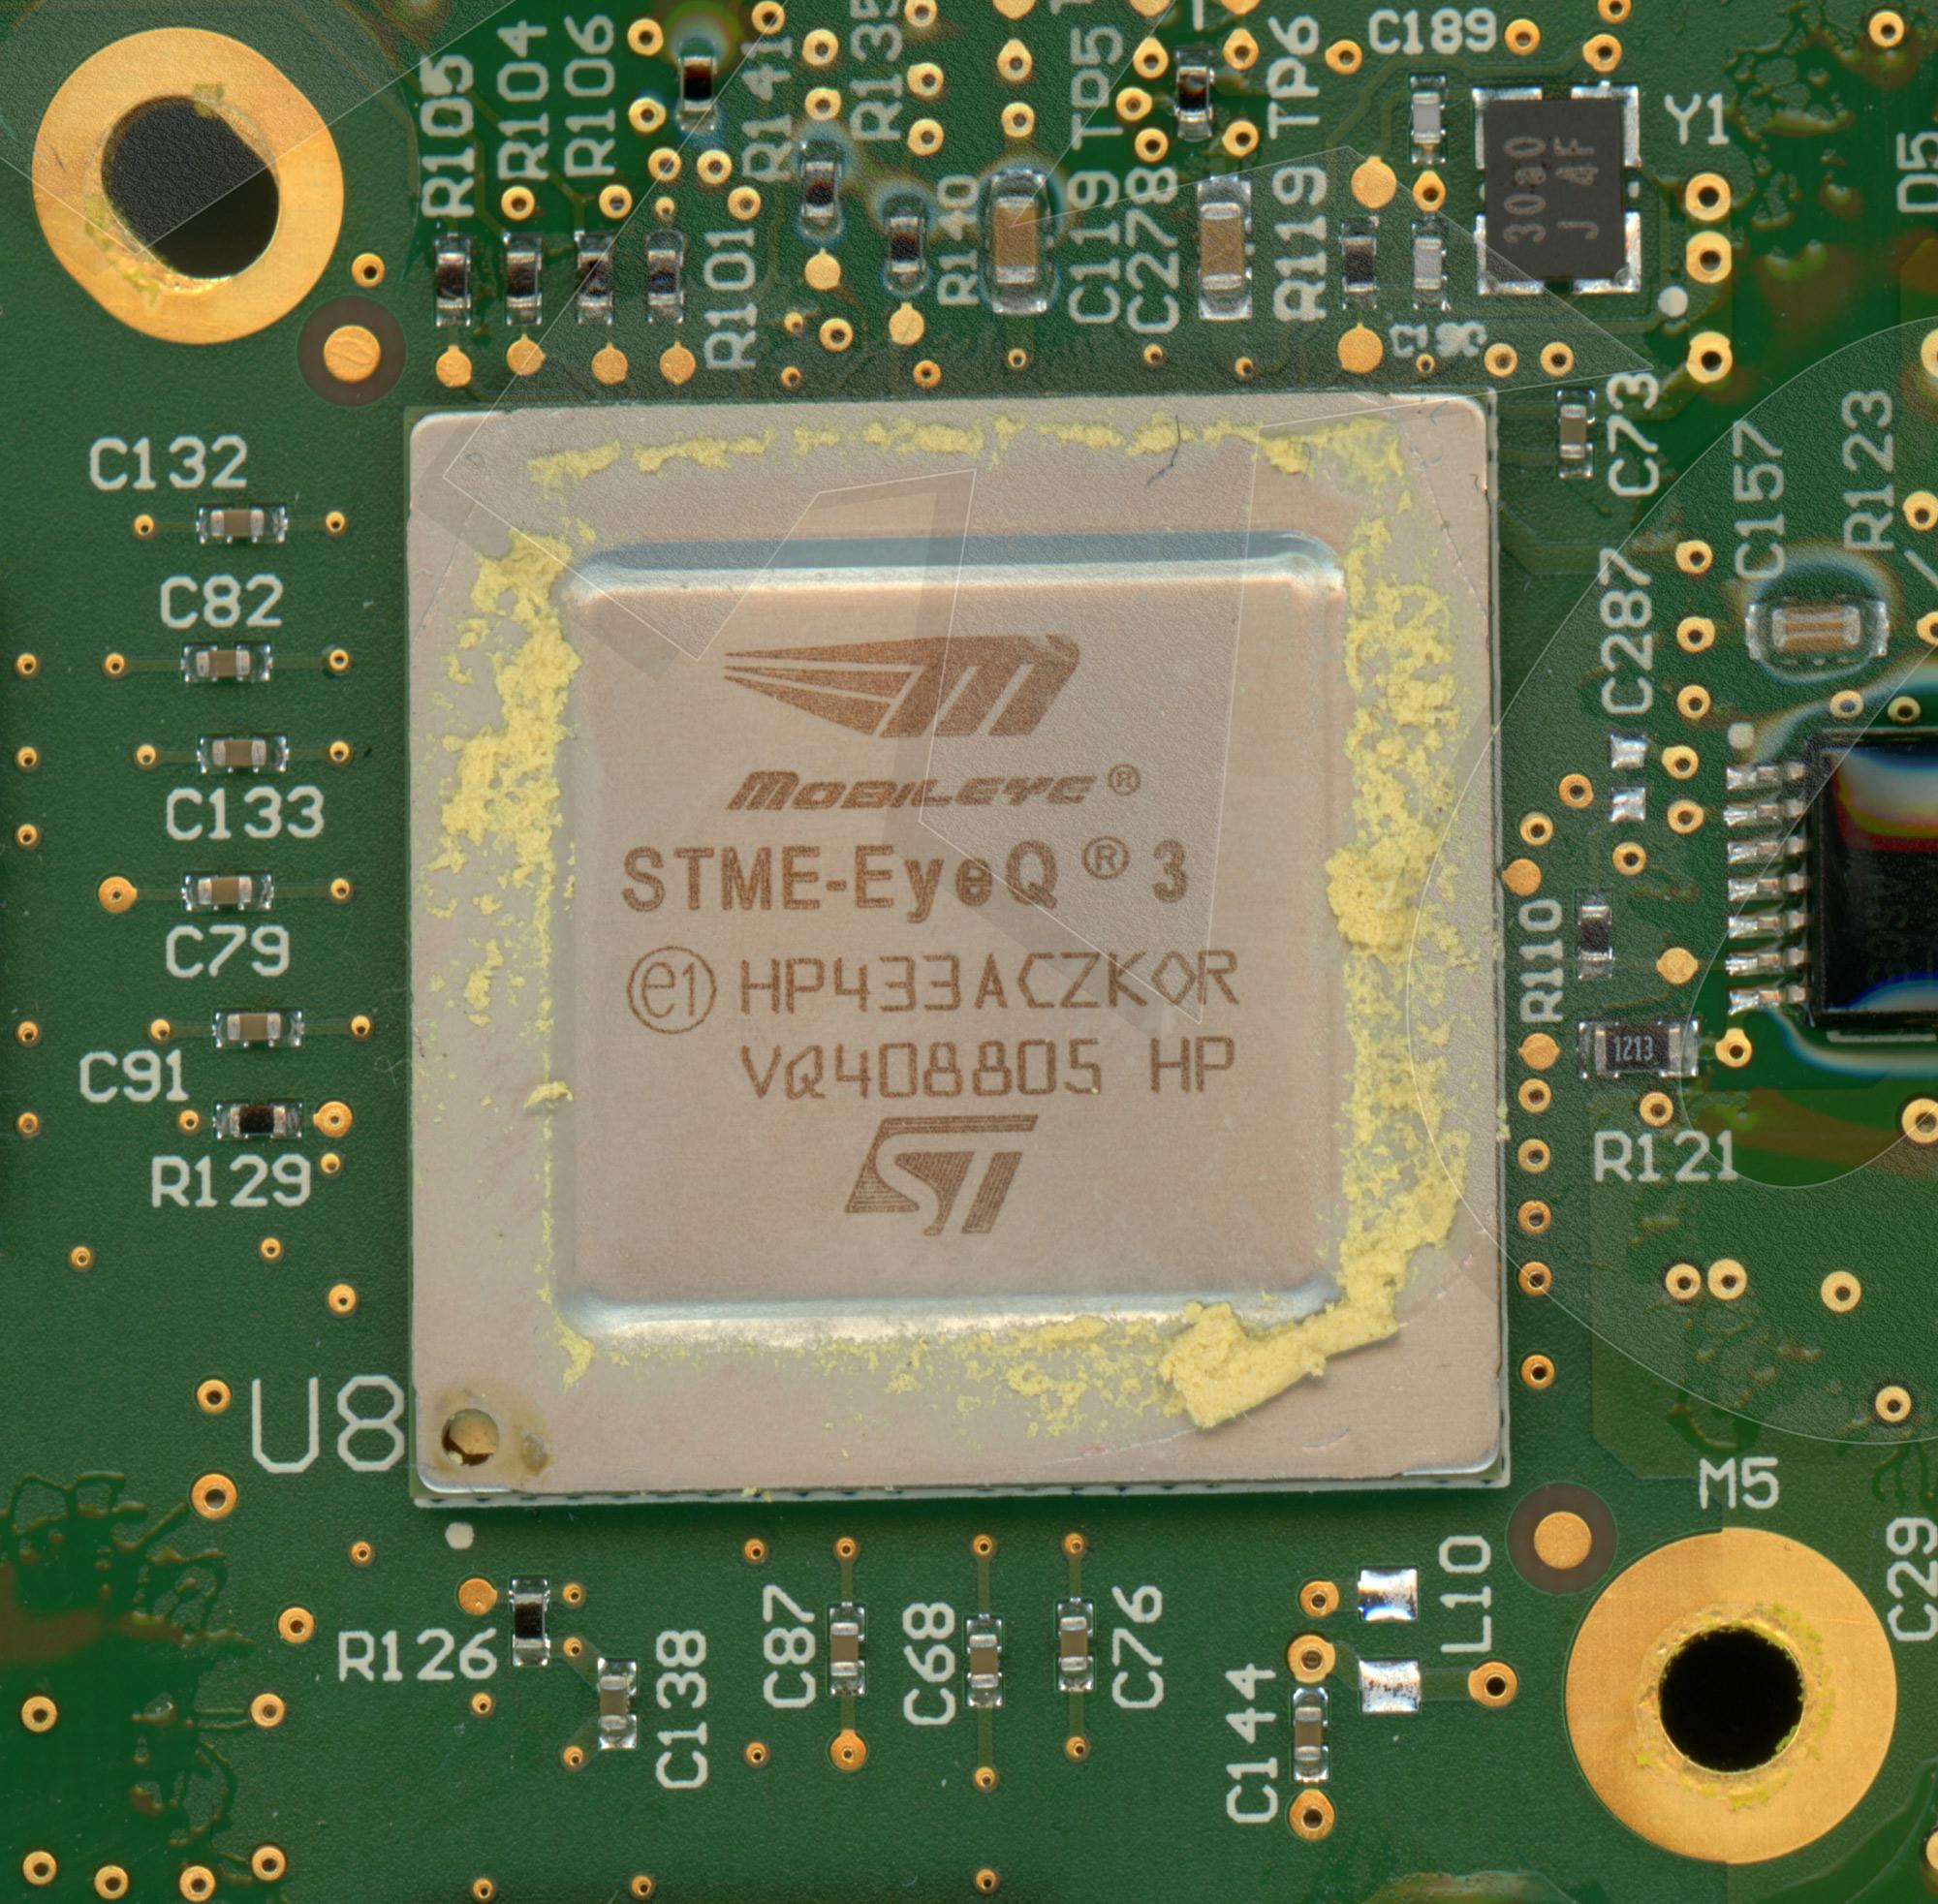 Tesla Mobileye EyeQ3 chip detail